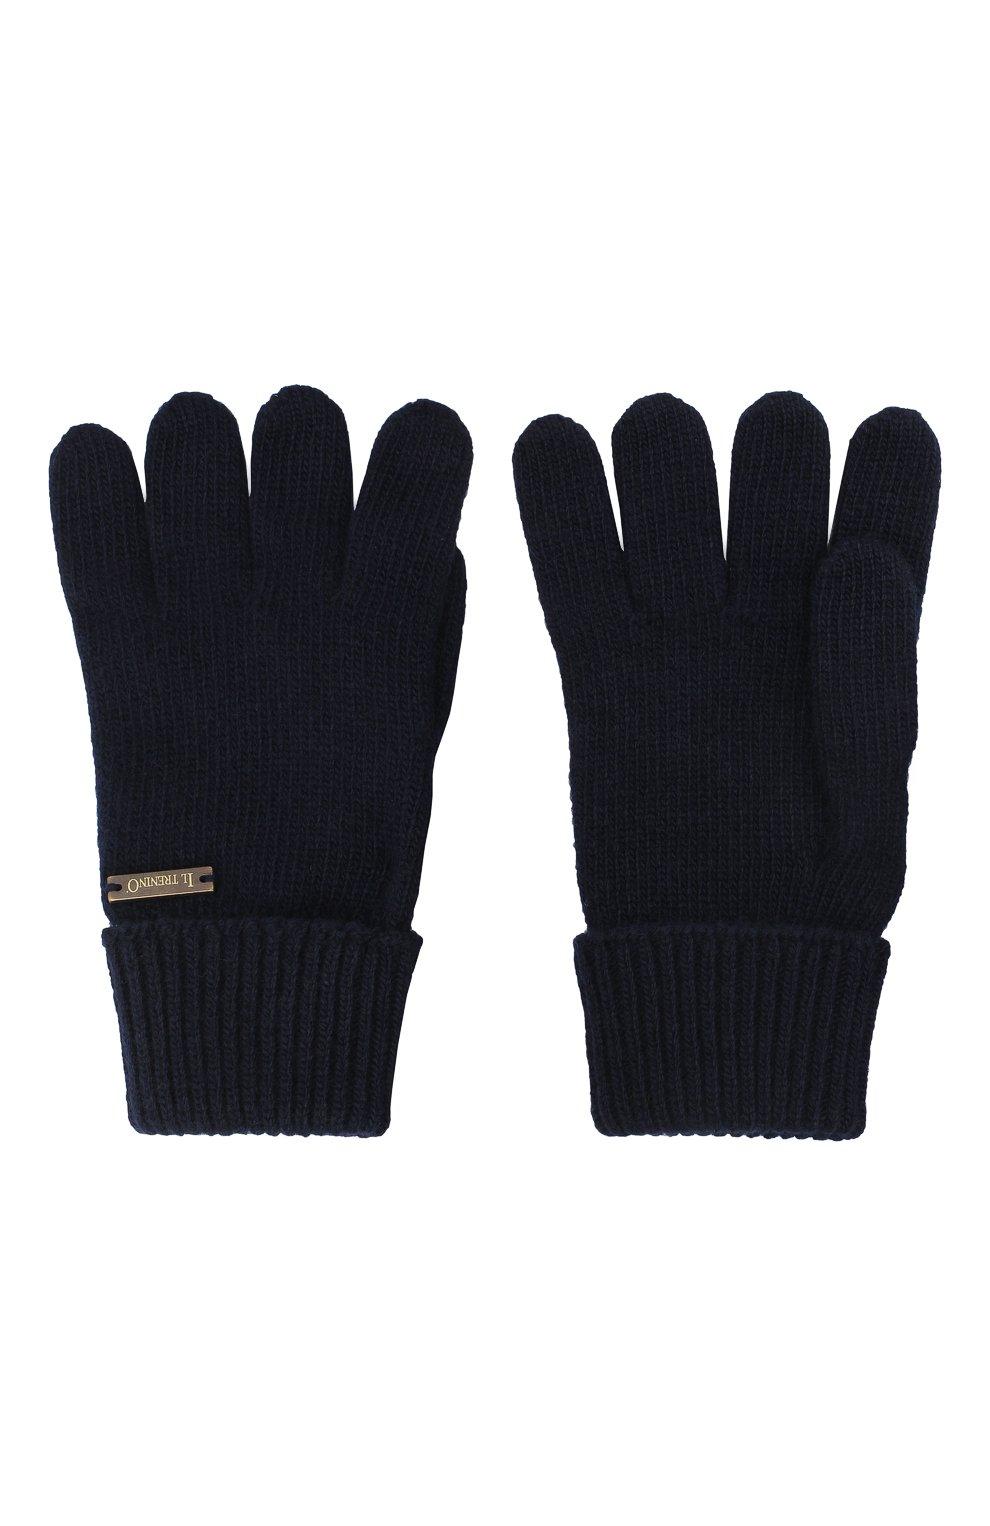 Детские шерстяные перчатки IL TRENINO темно-синего цвета, арт. 20 8218/E0 | Фото 2